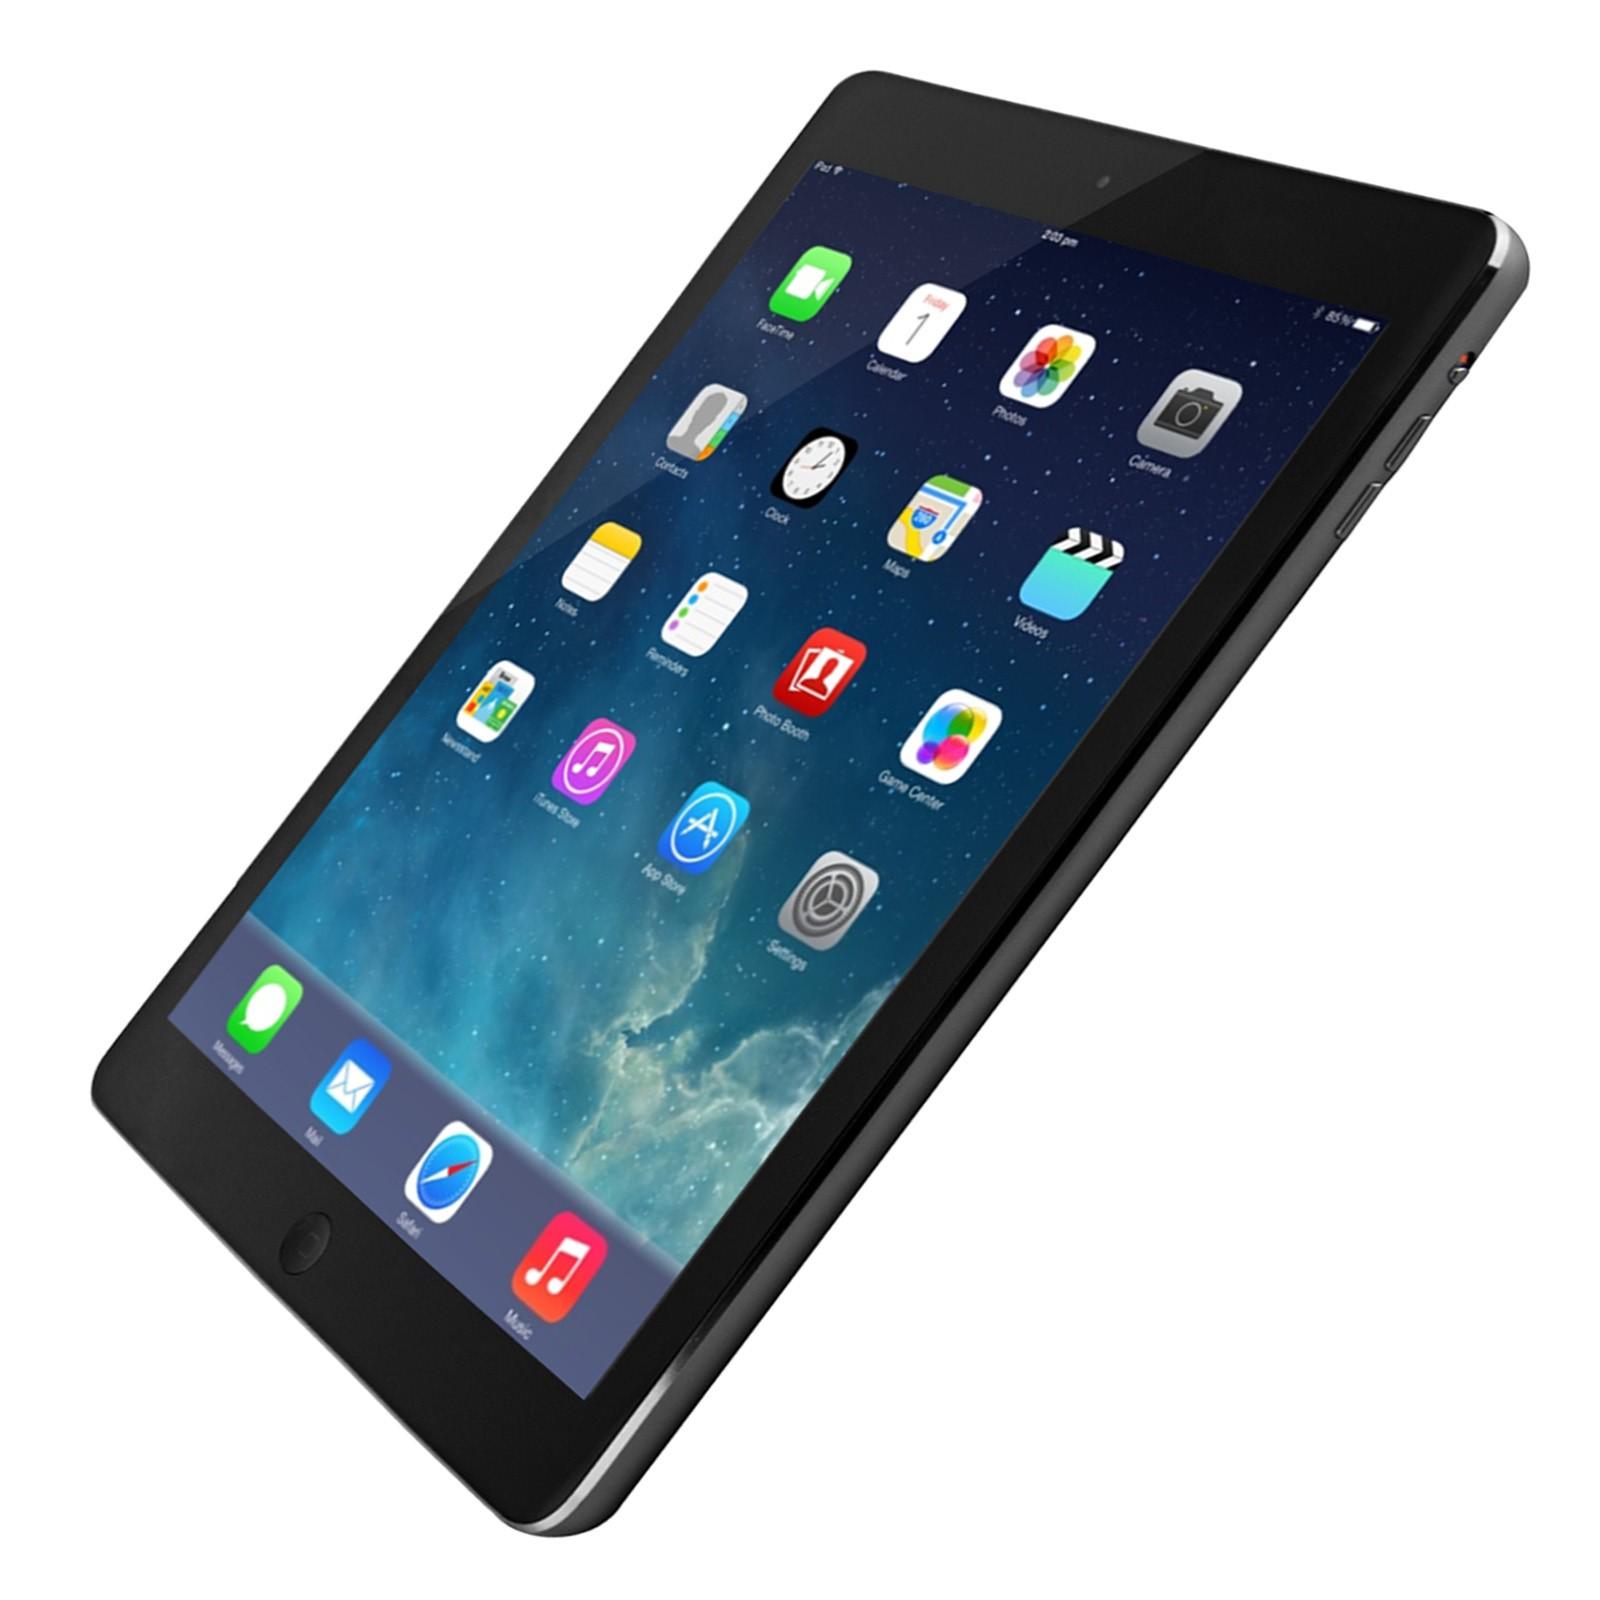 apple ipad air 32gb 9 7 retina display wi fi tablet. Black Bedroom Furniture Sets. Home Design Ideas